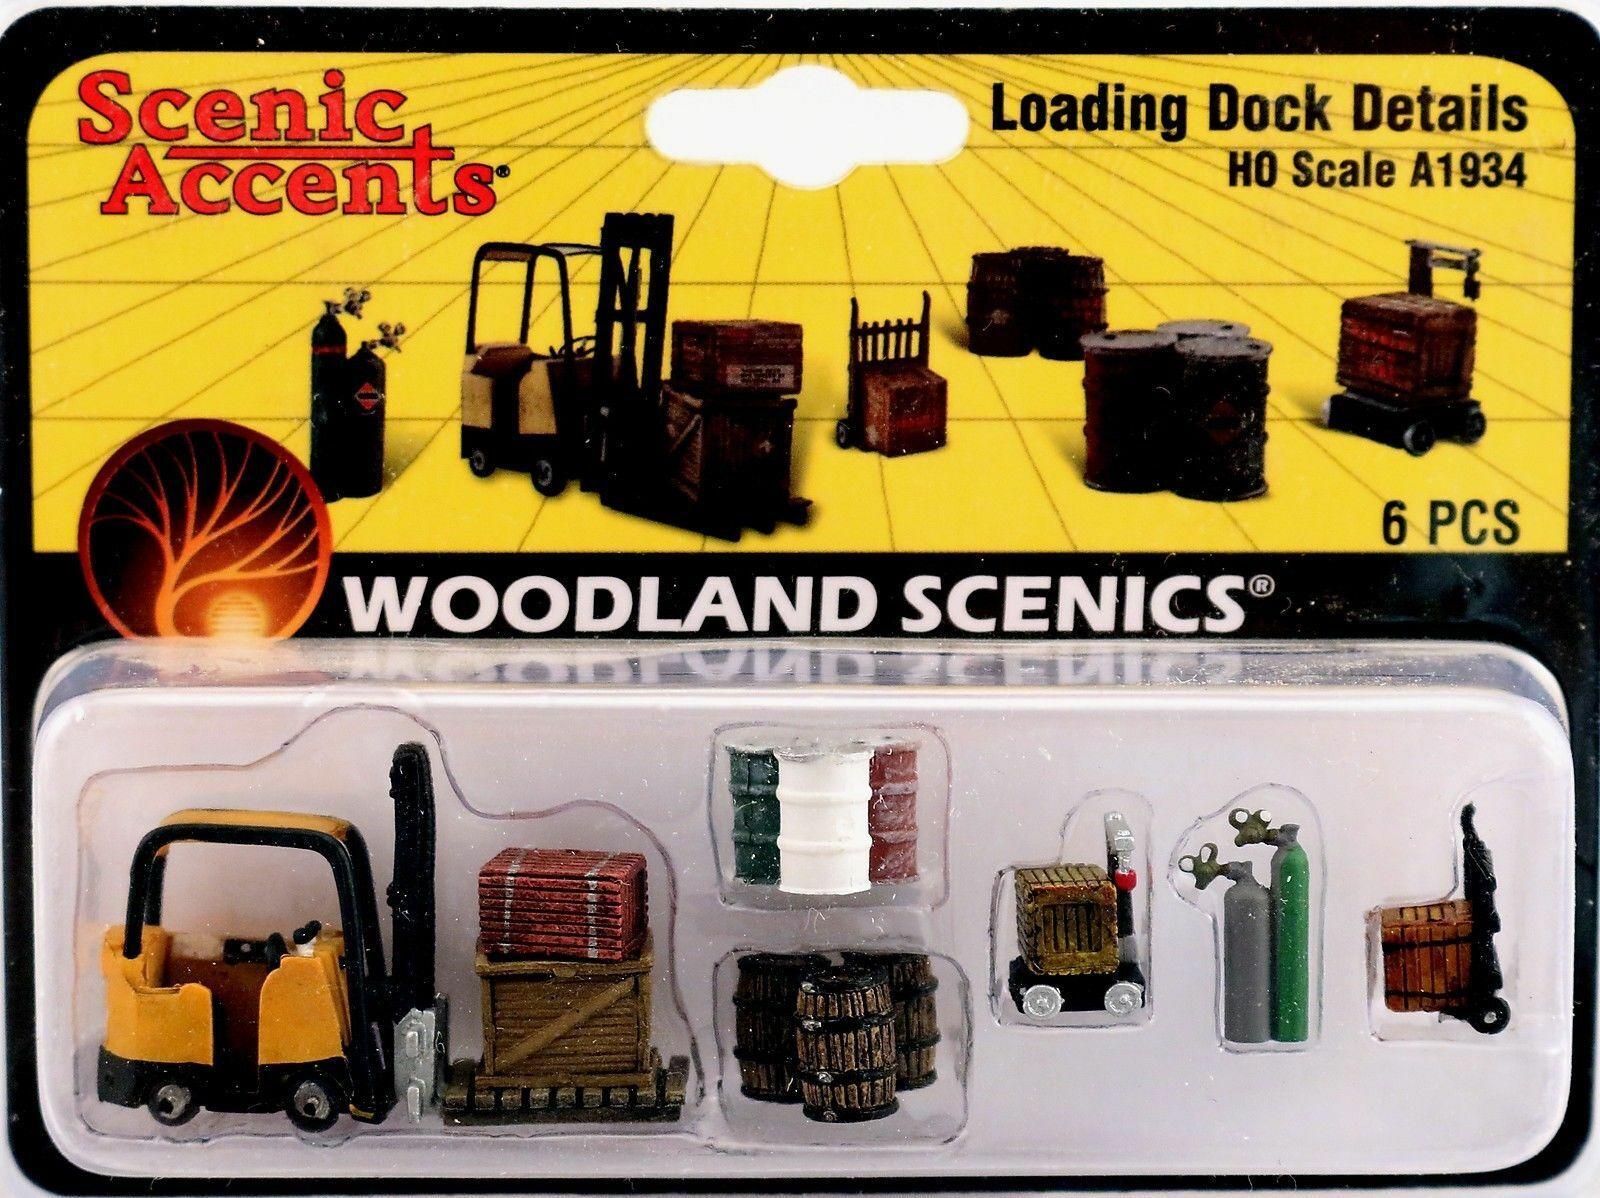 Woodland Scenics A1934 HO Train Figures Loading Dock Details